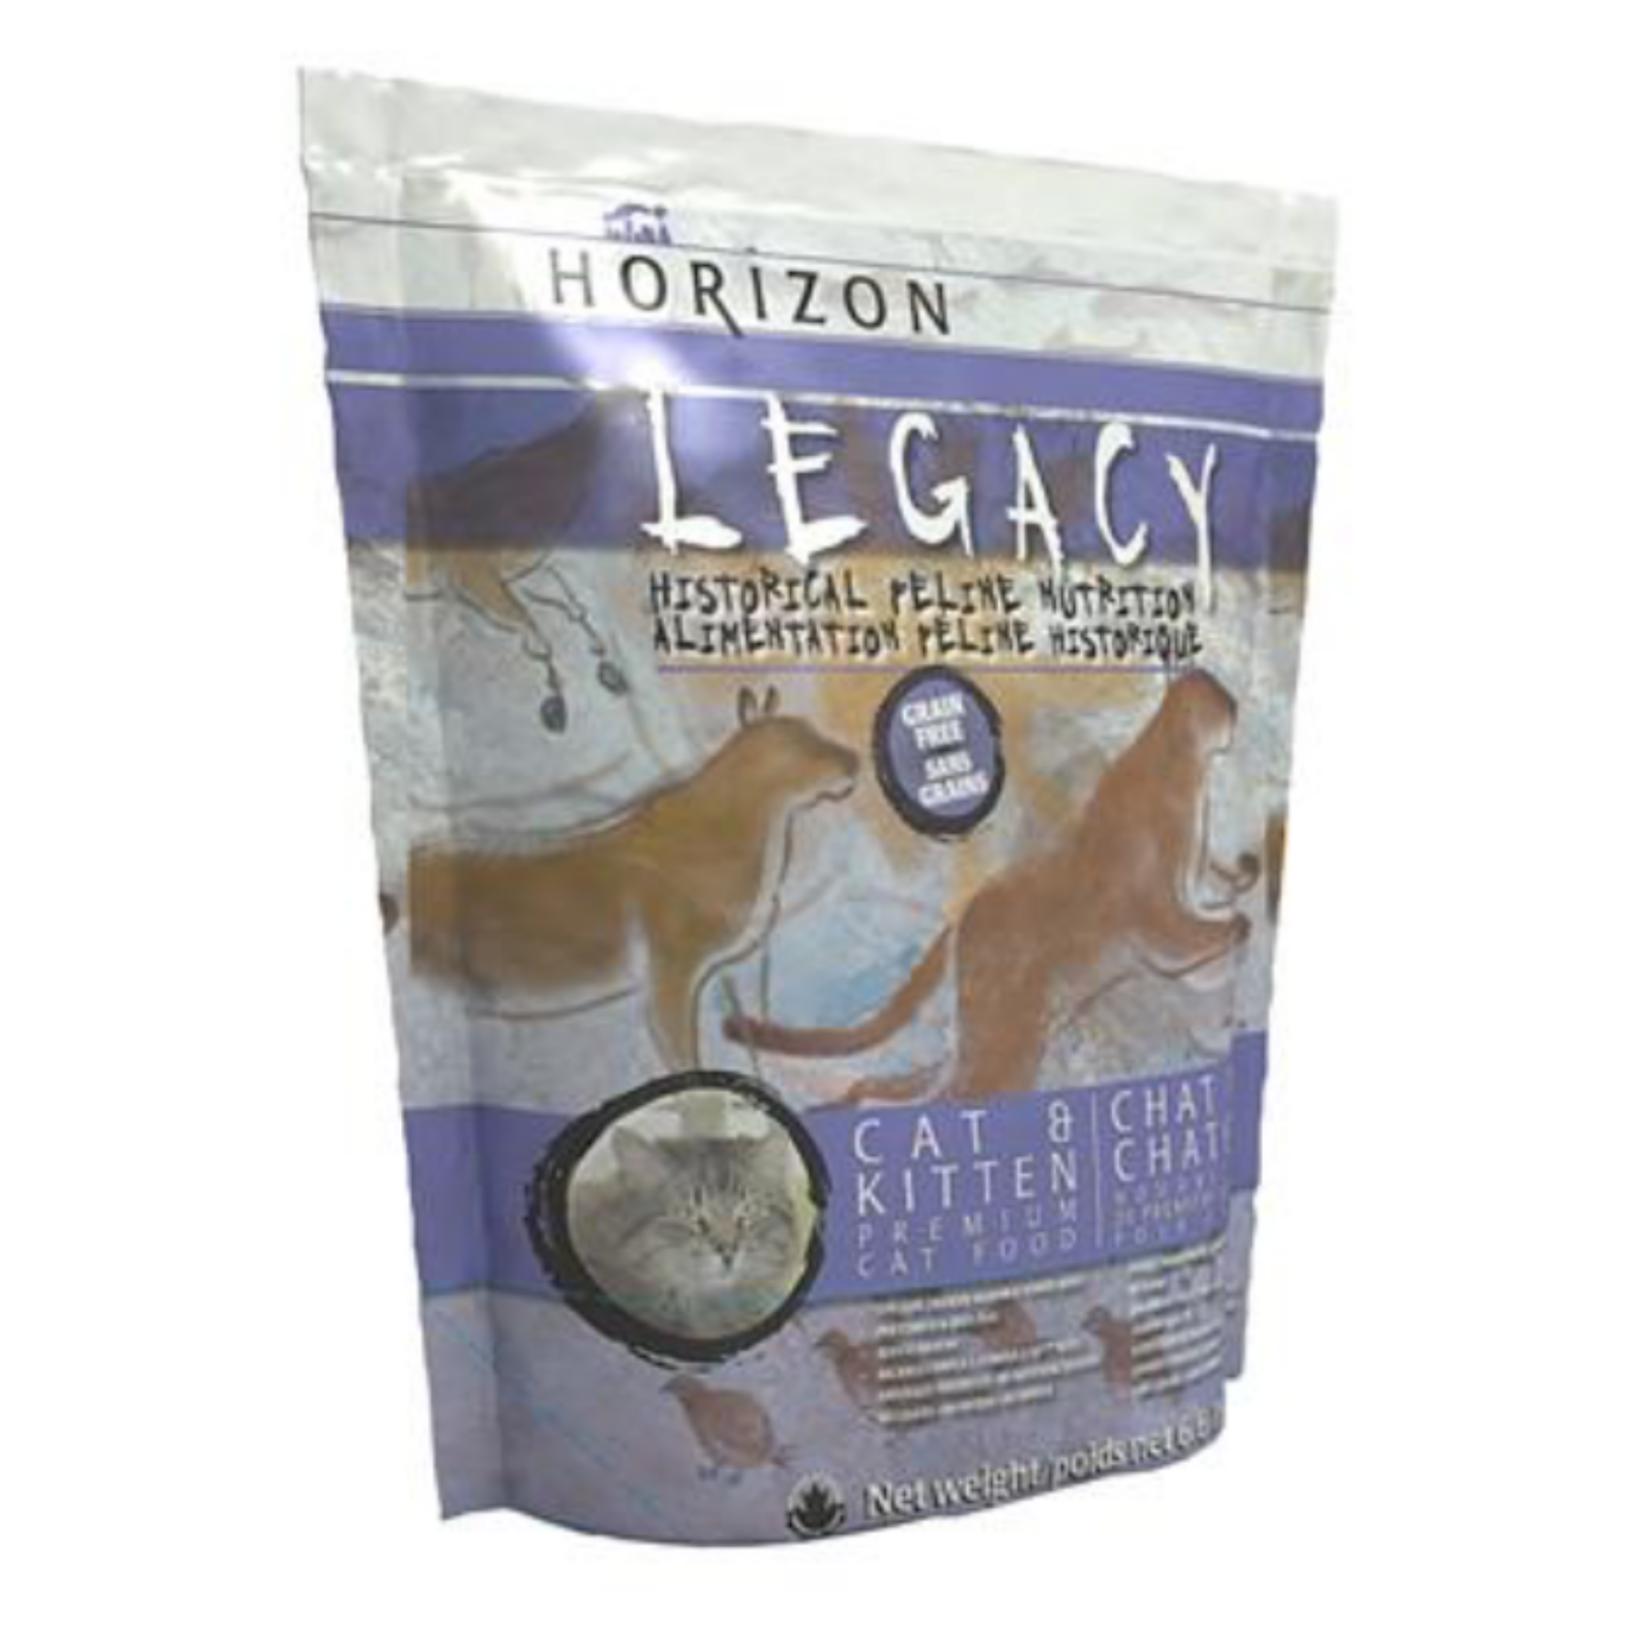 Horizon Legacy GF Cat and Kitten recipe 6.6lb